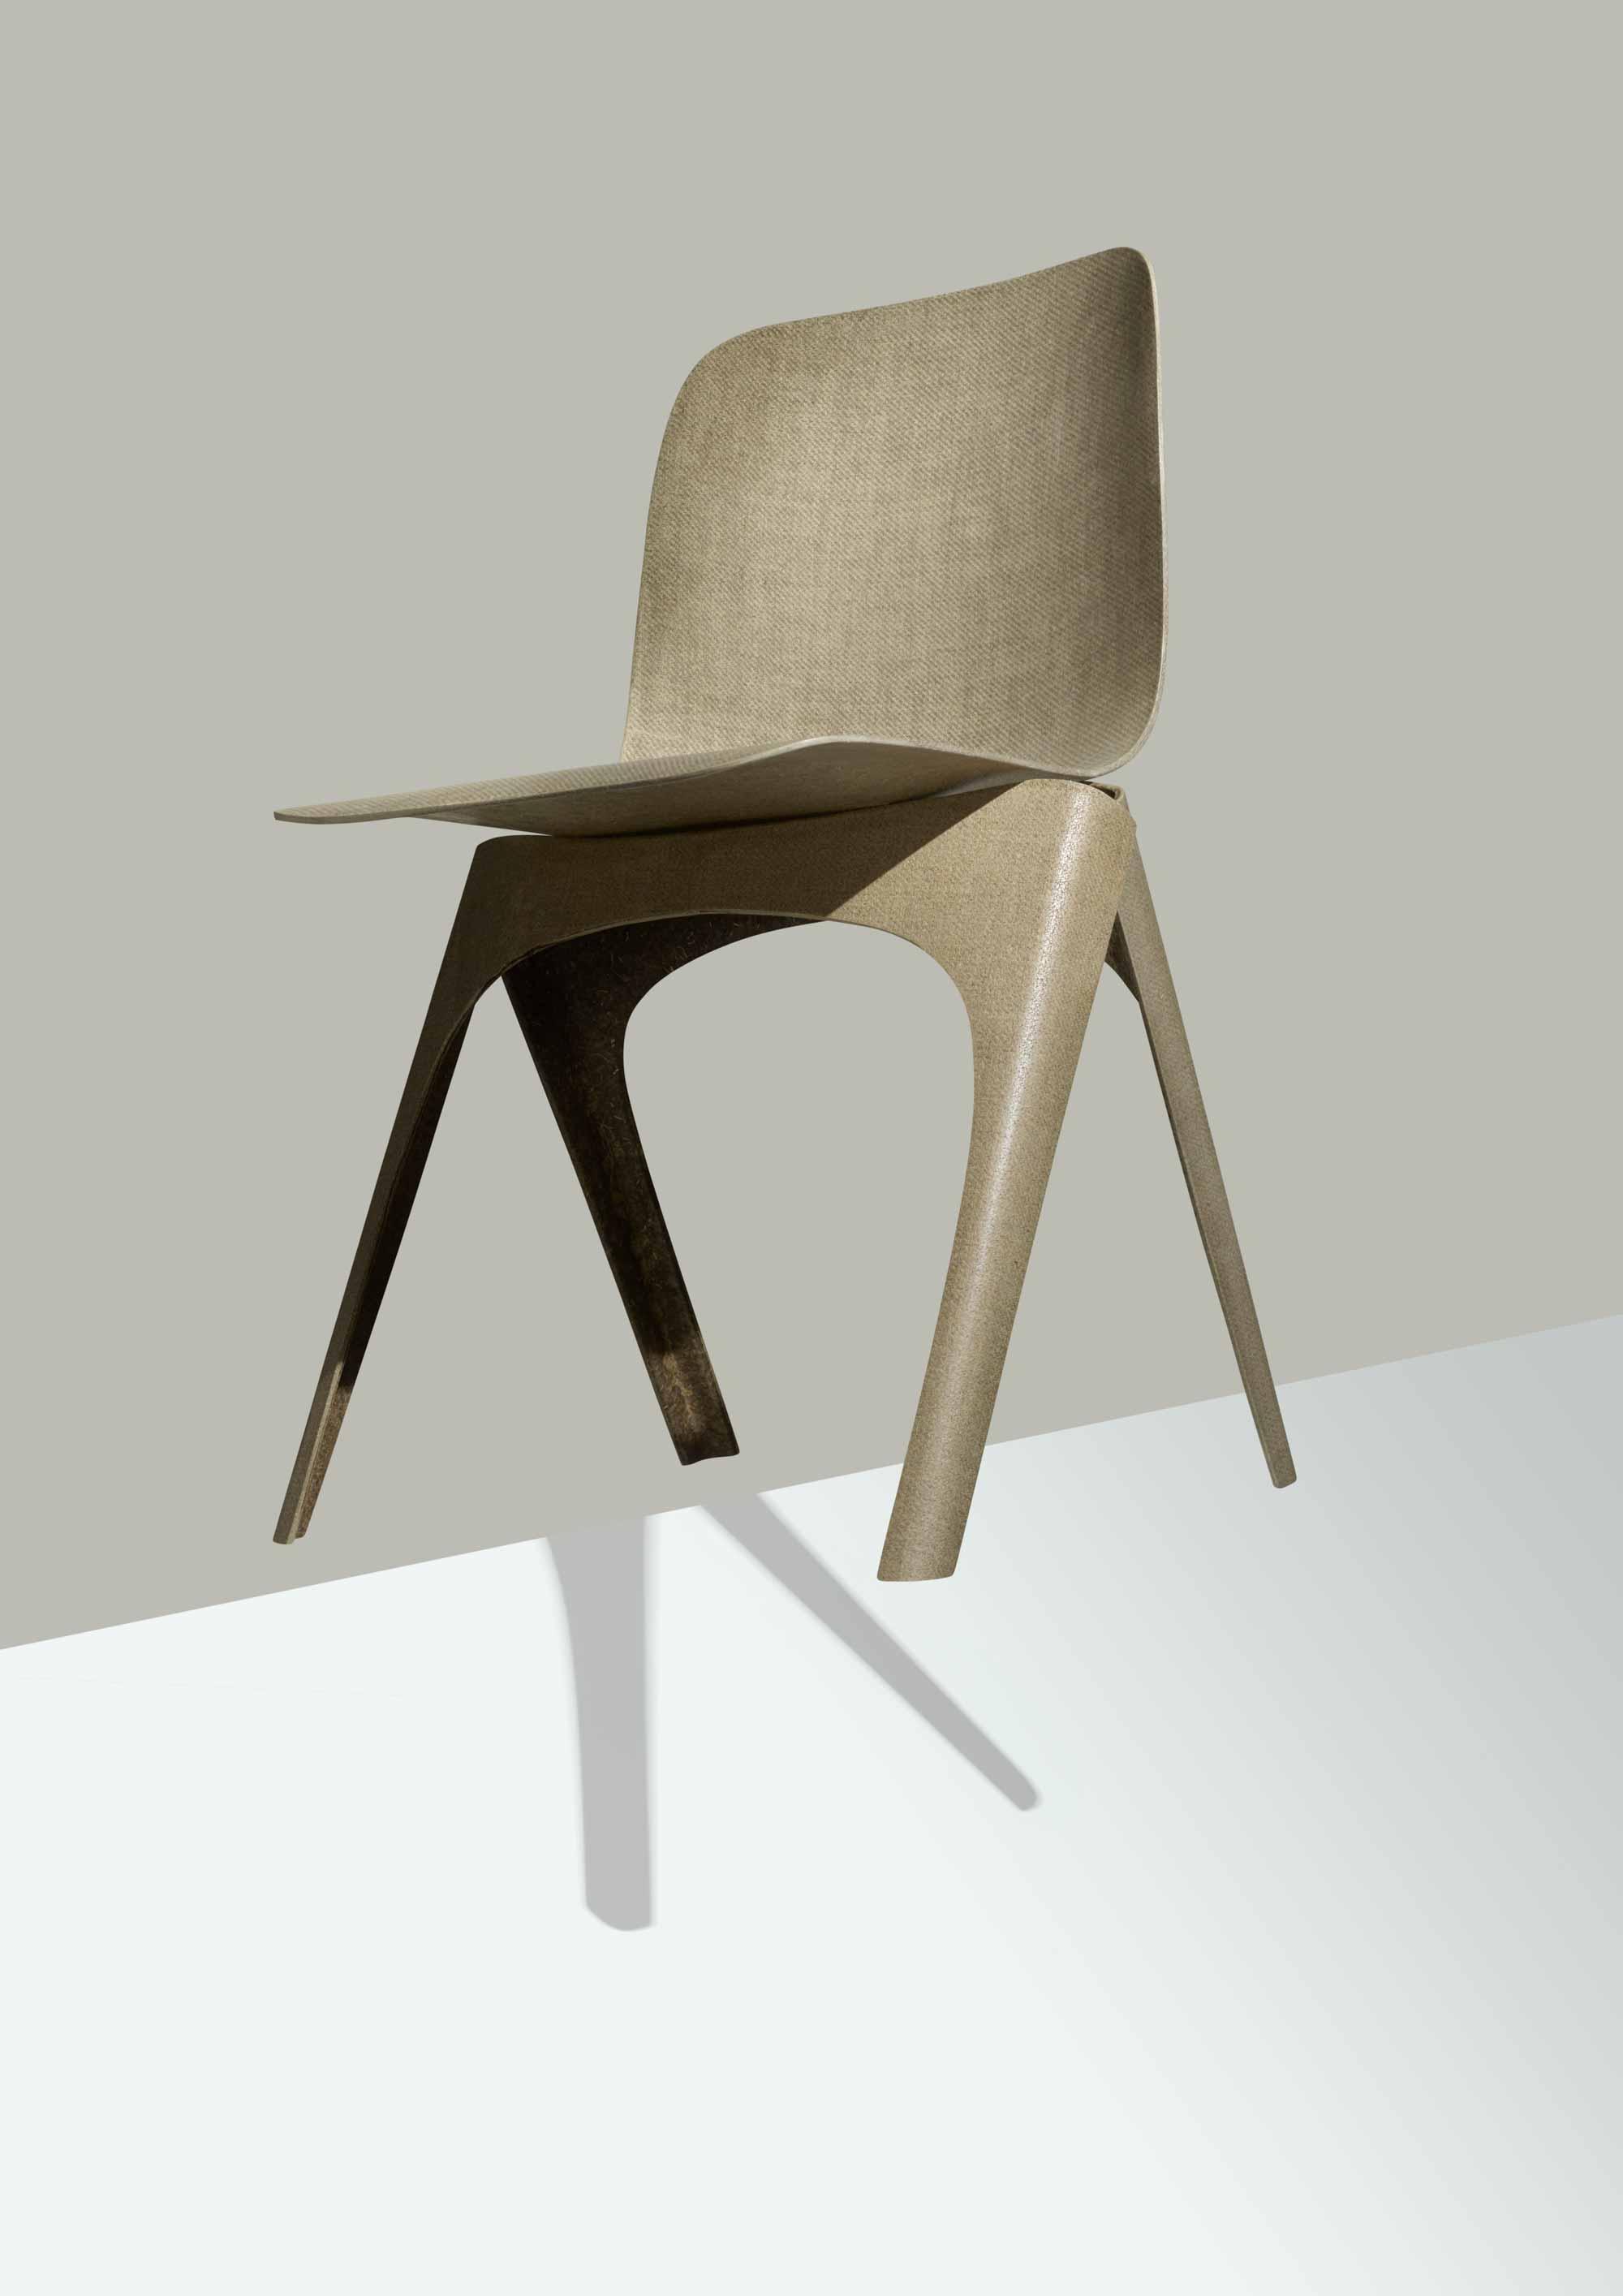 Duurzaam designkwartier | Flax Chair van Christien Meindertsma en Labelbreed | vtwonen.nl